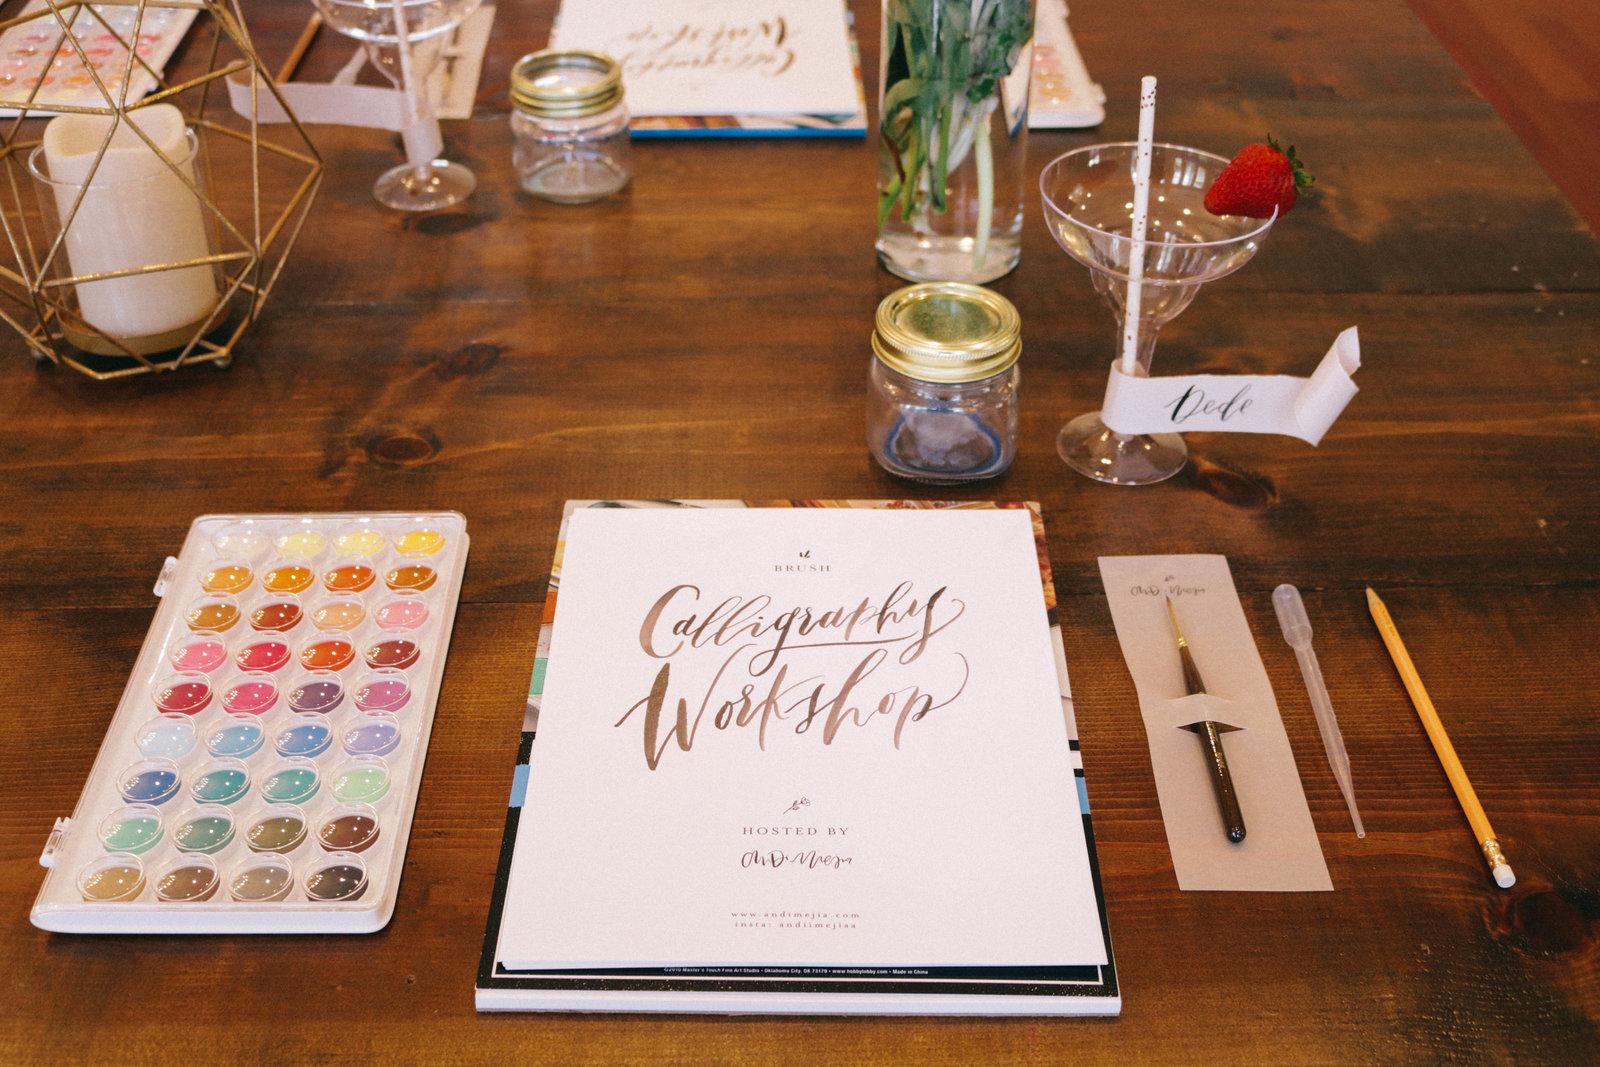 Andi Mejia Orlando Calligraphy Workshops